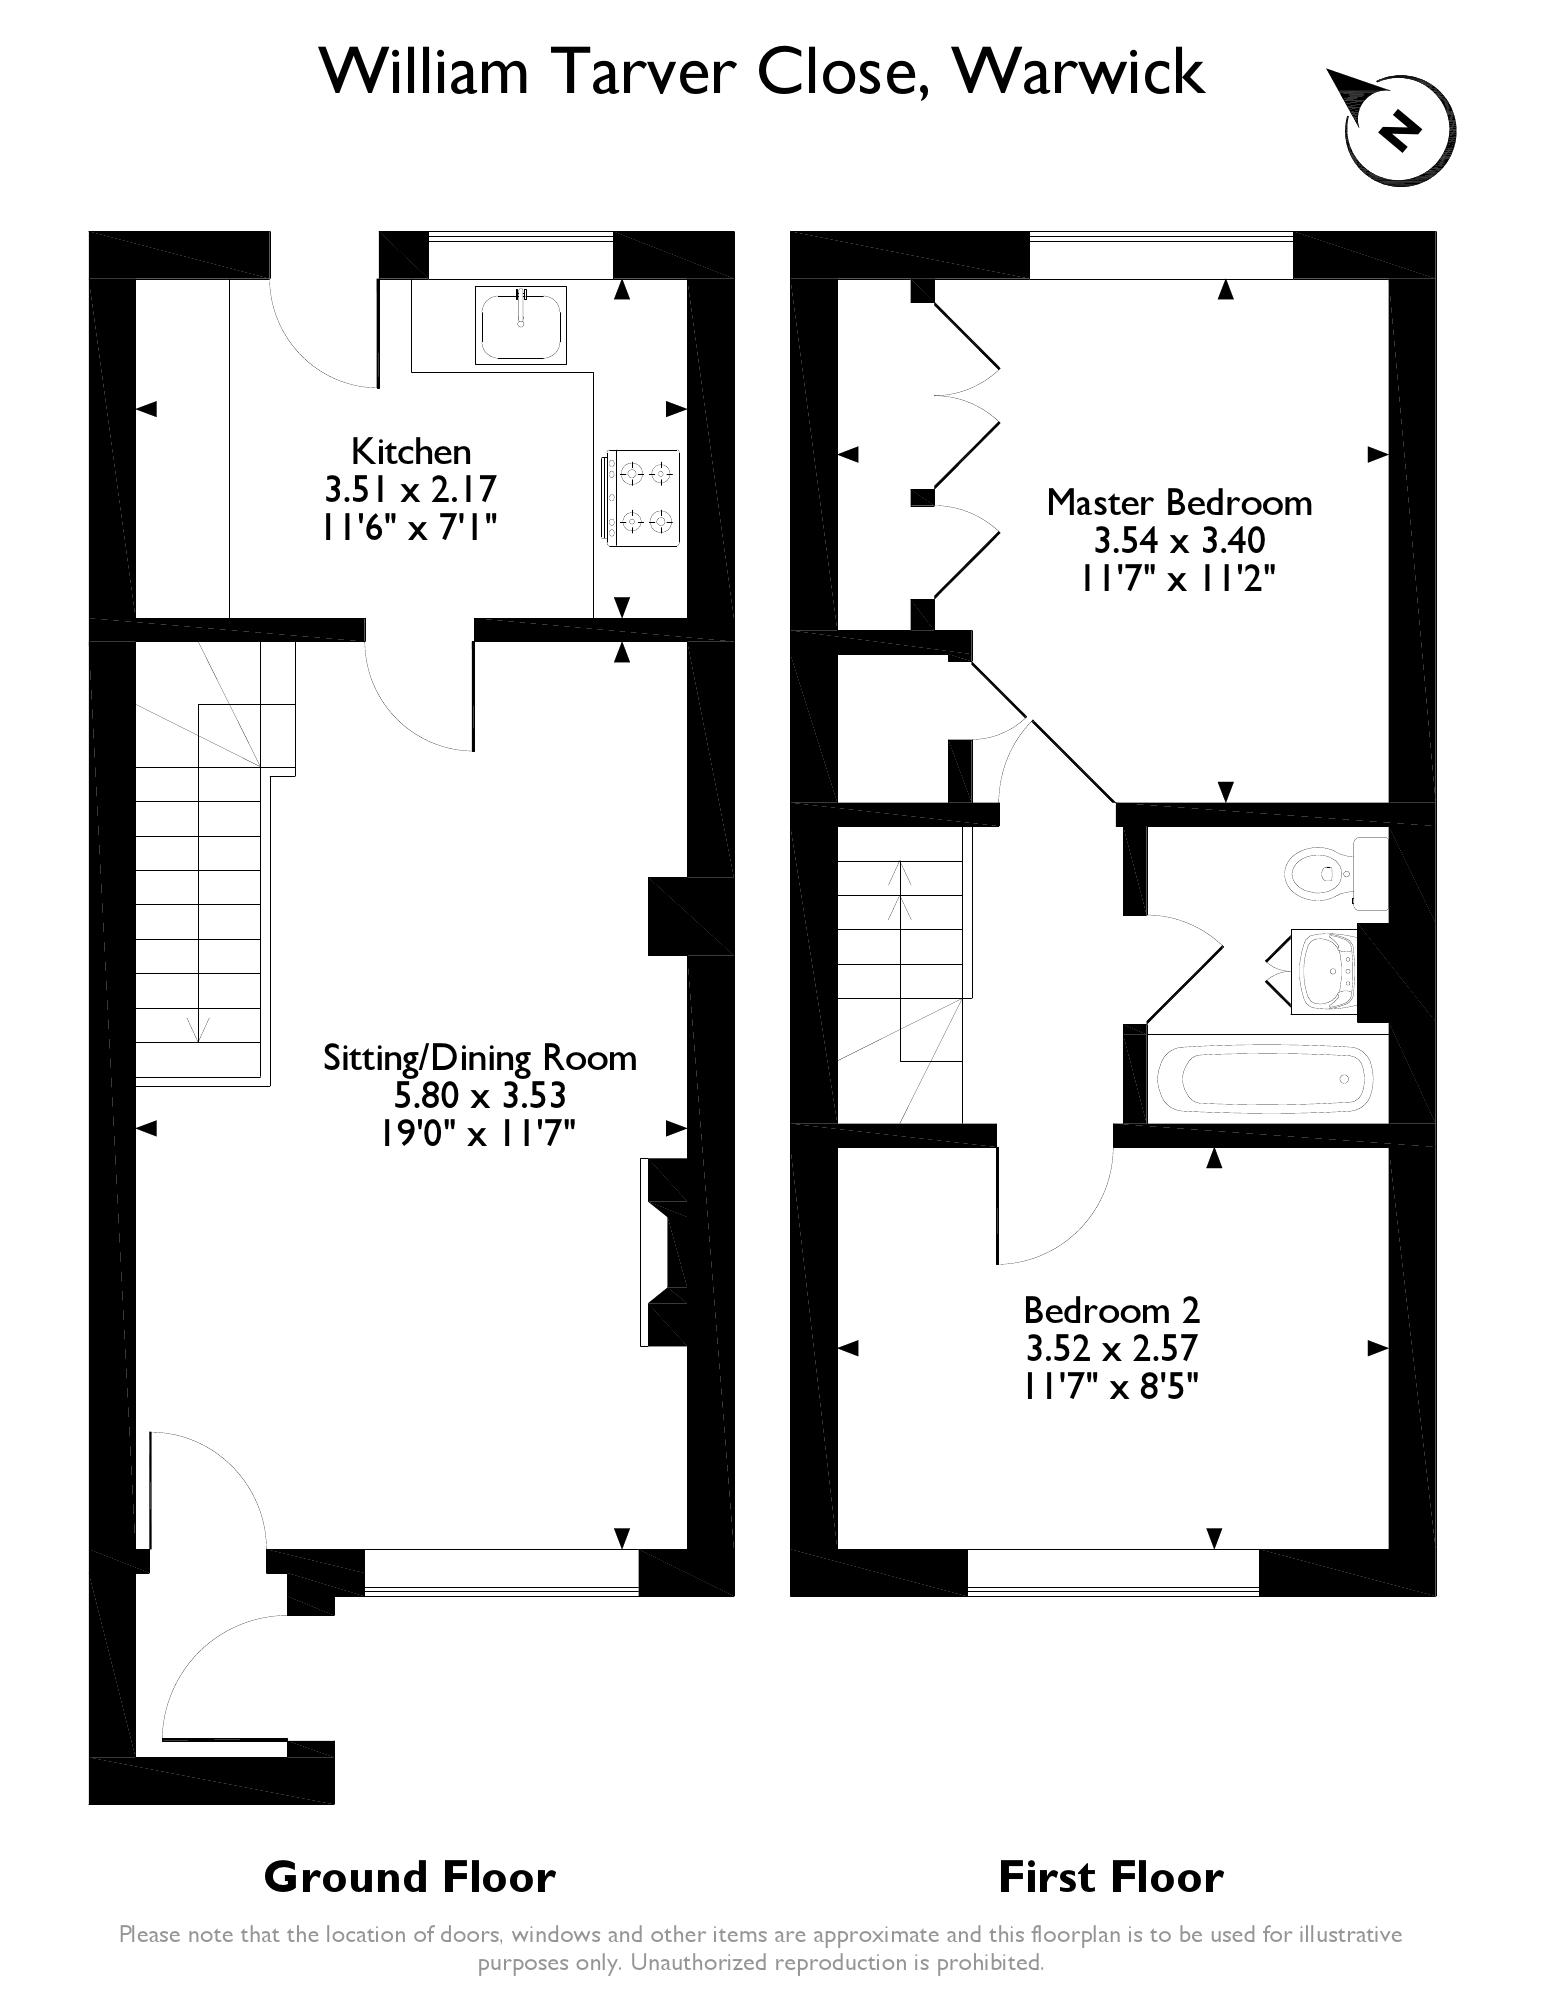 Warwick Castle Floor Plan William Tarver Close Warwick Cv34 2 Bedroom Terraced